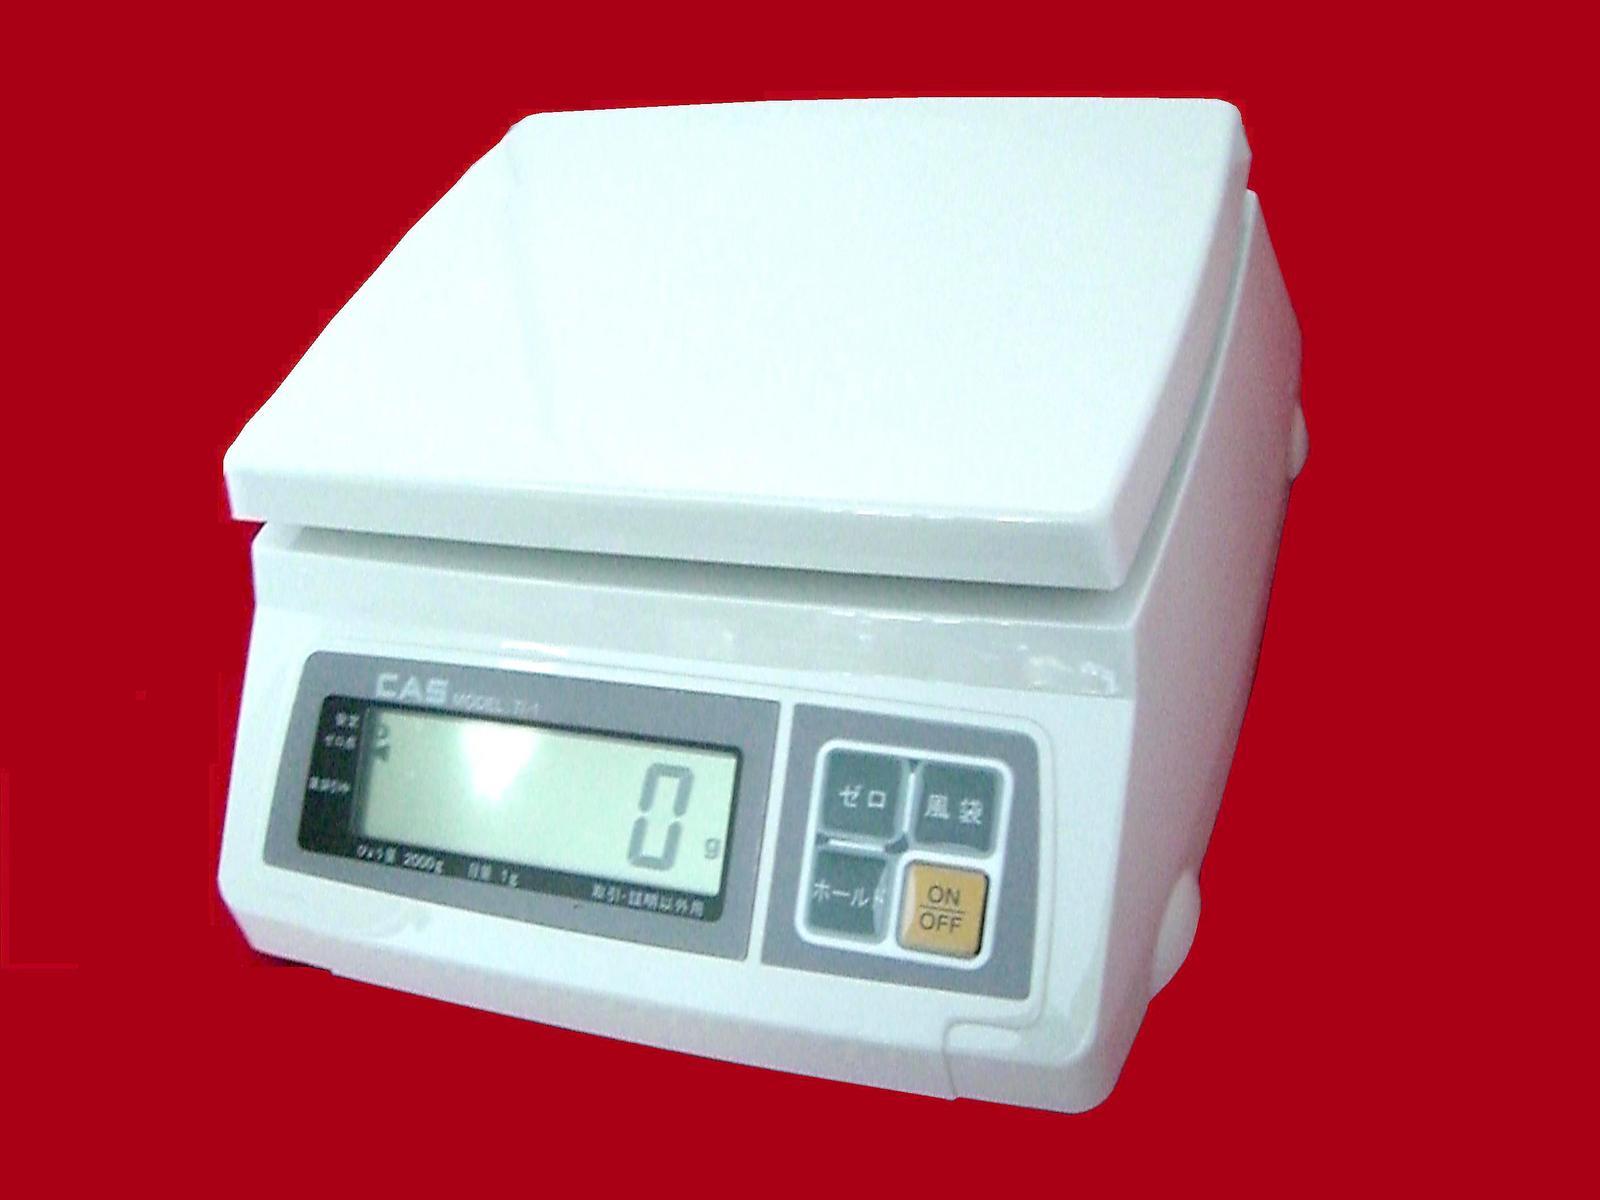 ■CASデジタル秤 2・5・10・20kg 秤(はかり) 1/2000高分解能